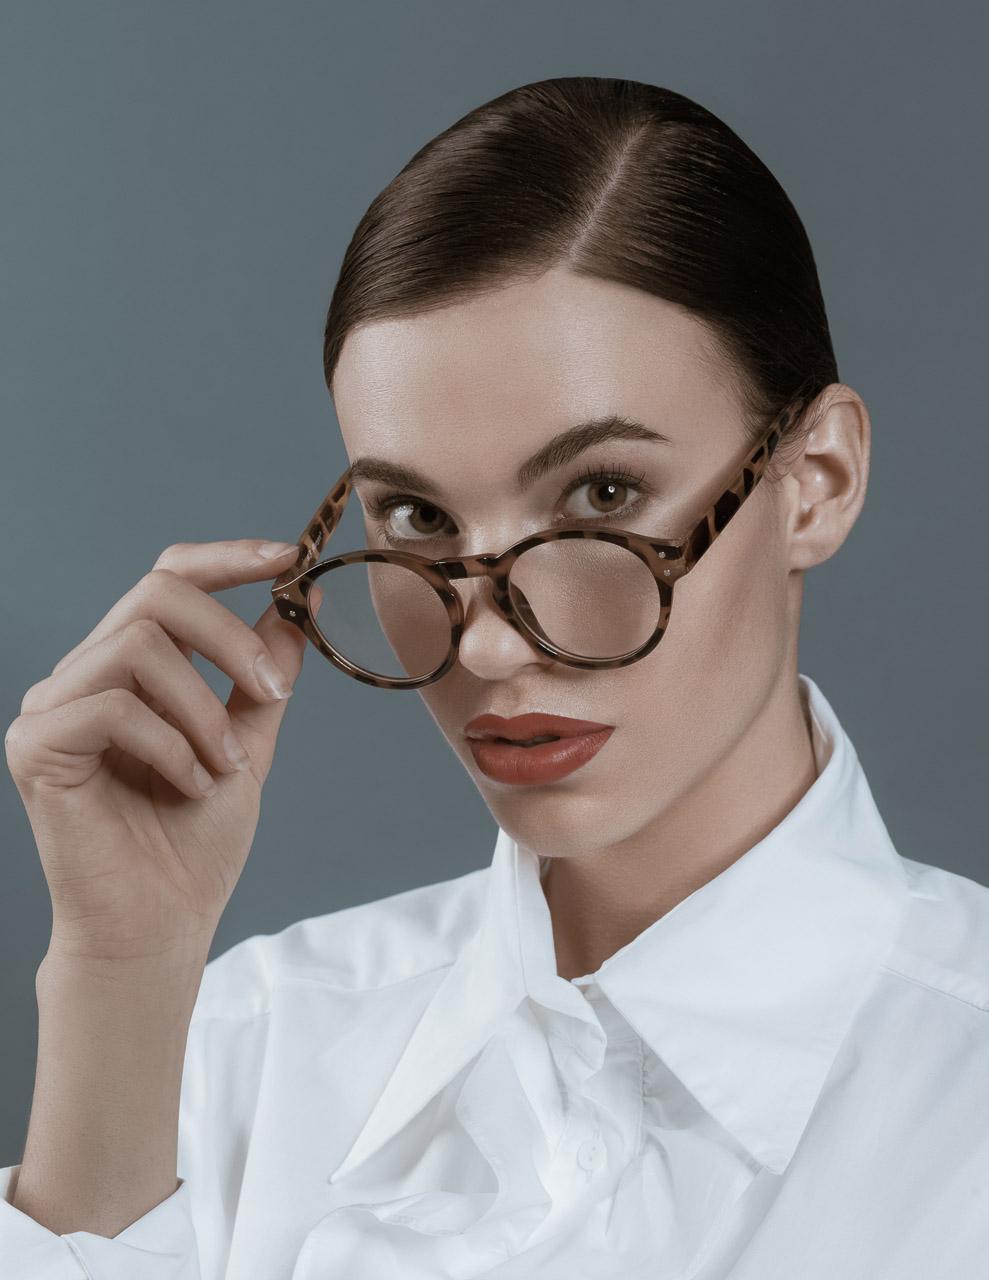 Nadia-Duca-Makeup-Artist-commercial (26).jpg